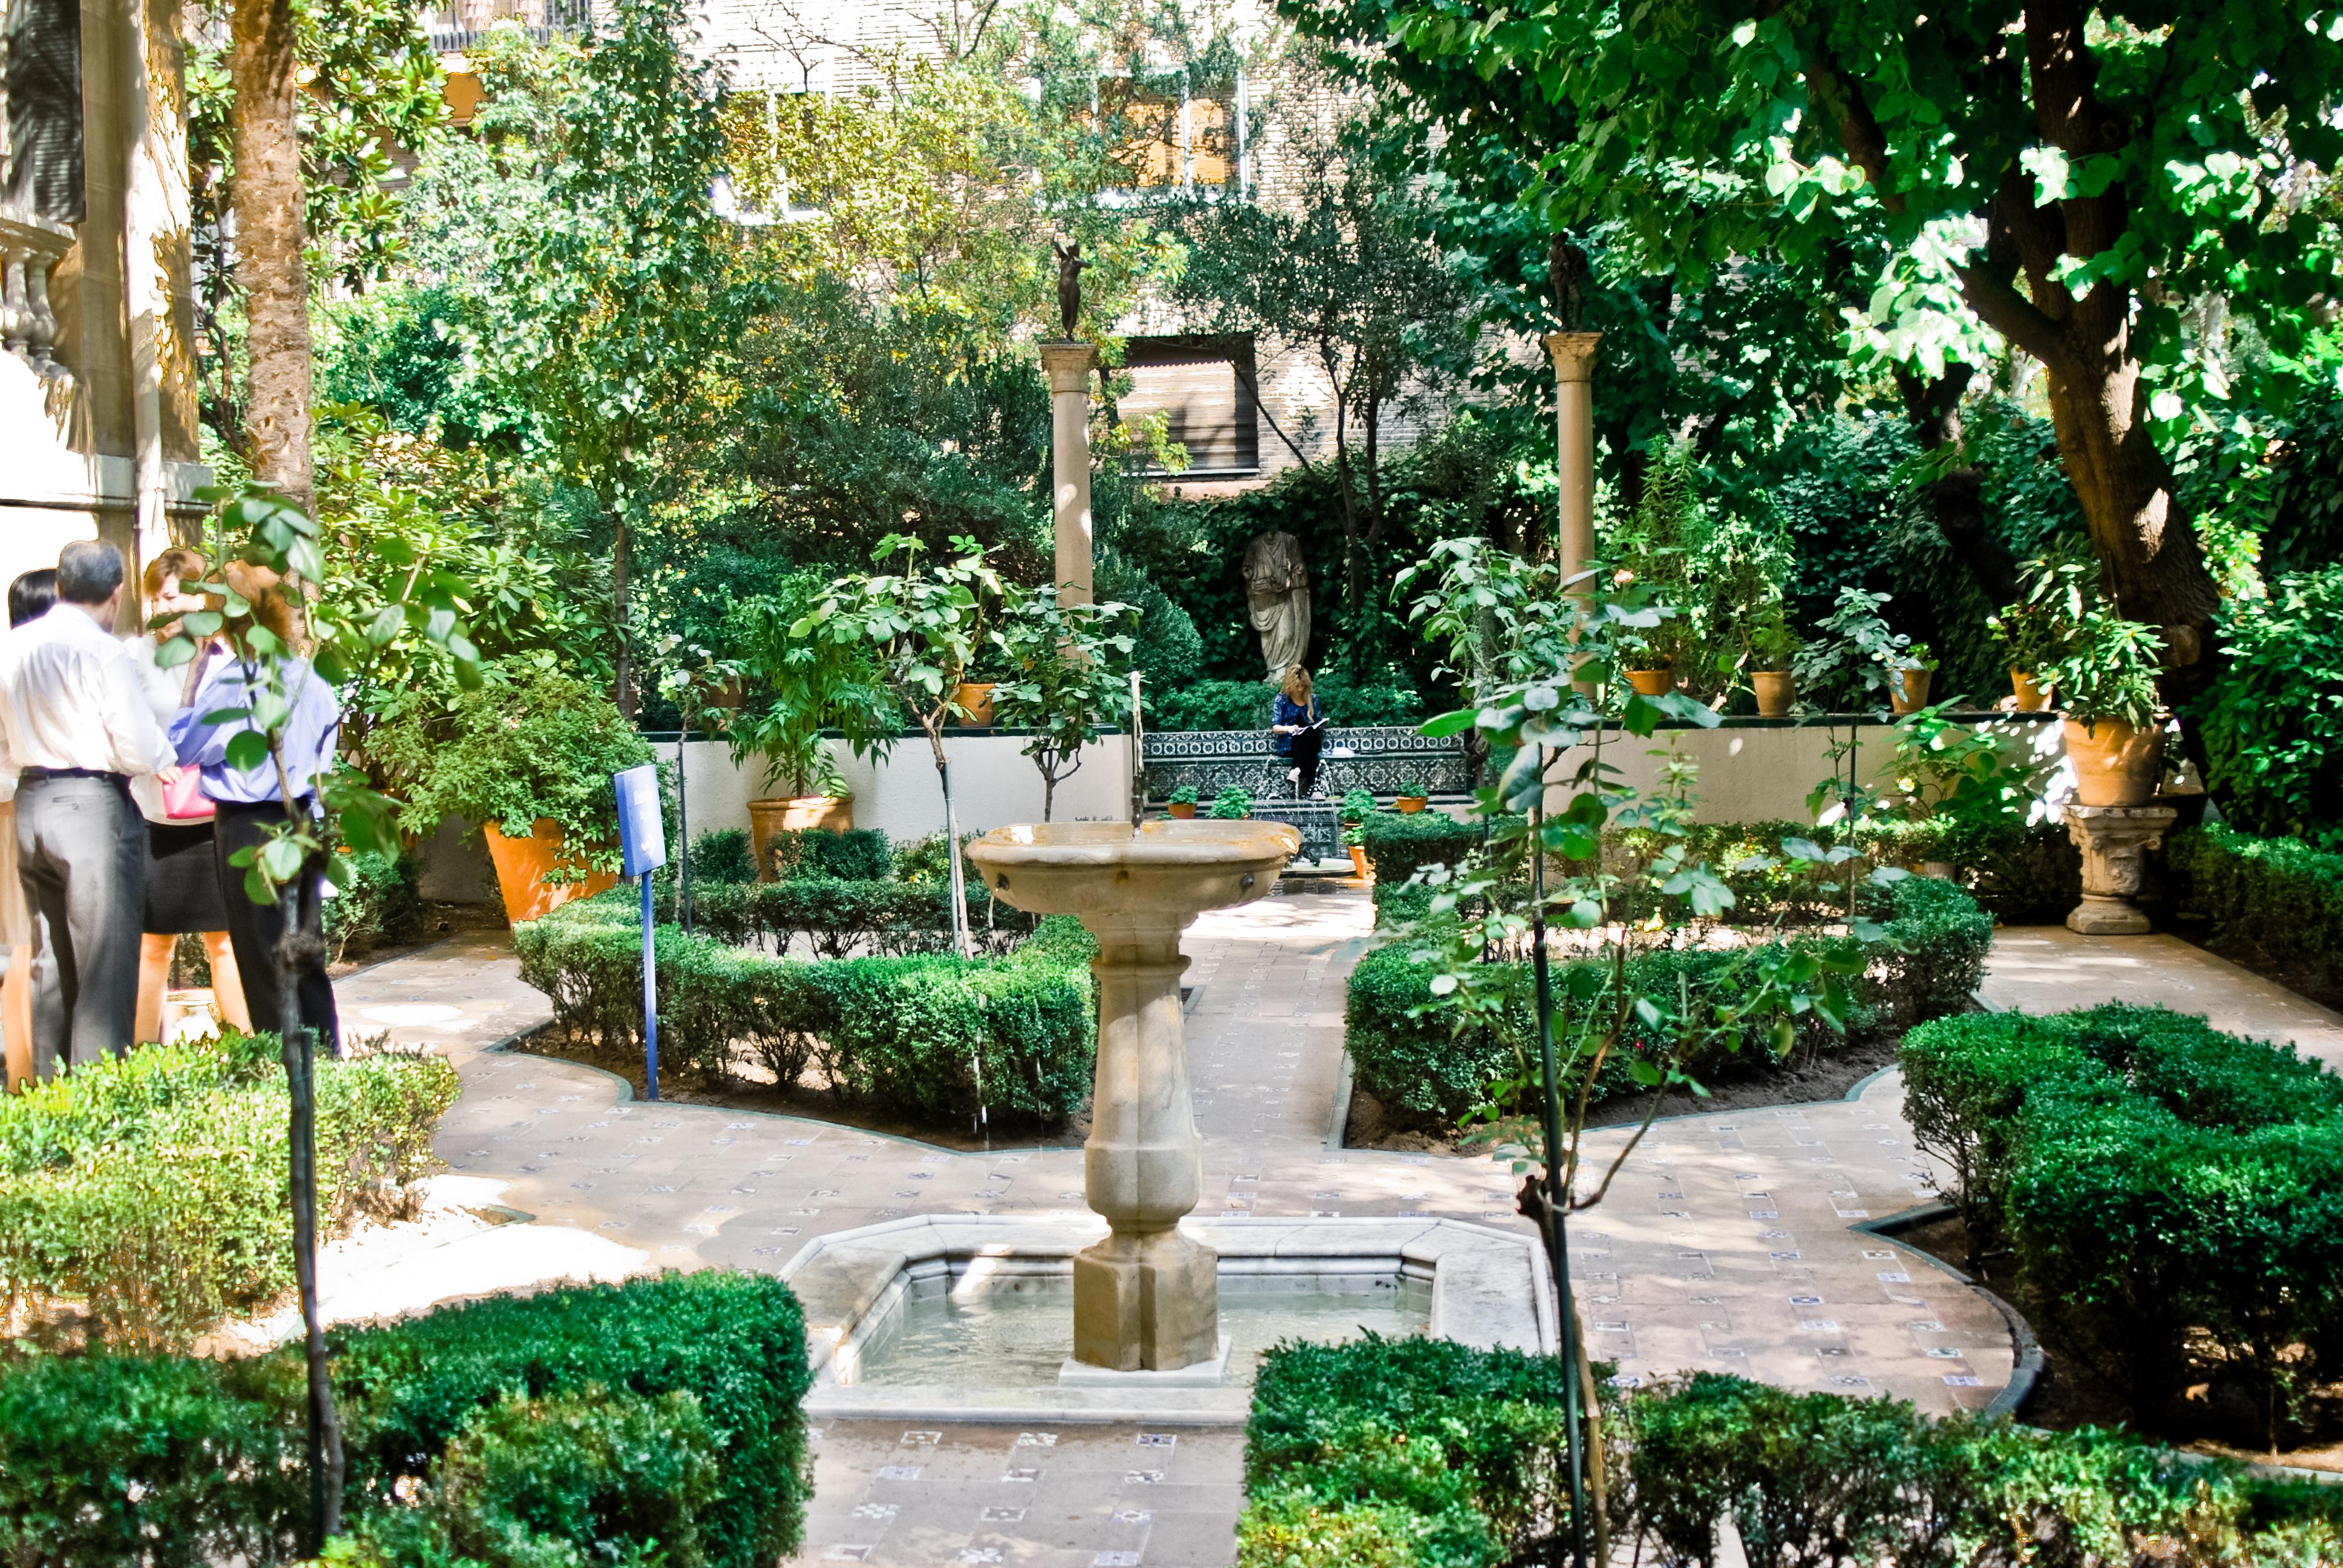 garden scene in Madrid